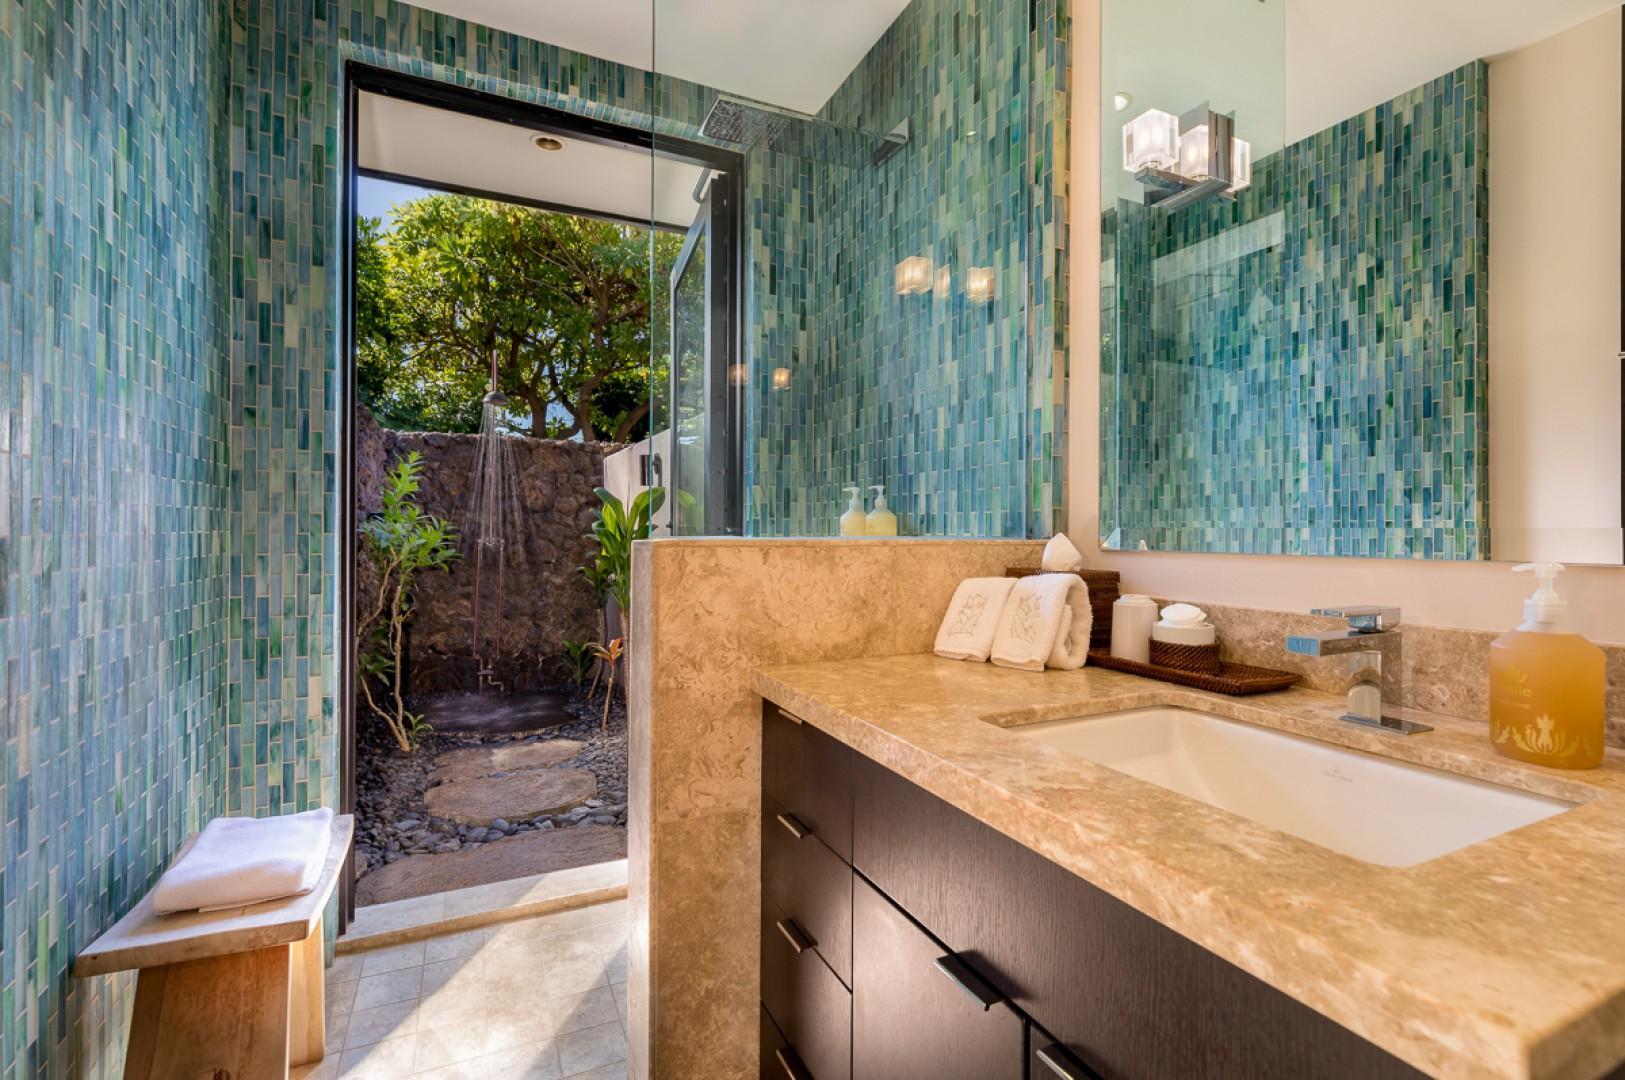 Another luxurious bath with an outdoor shower garden